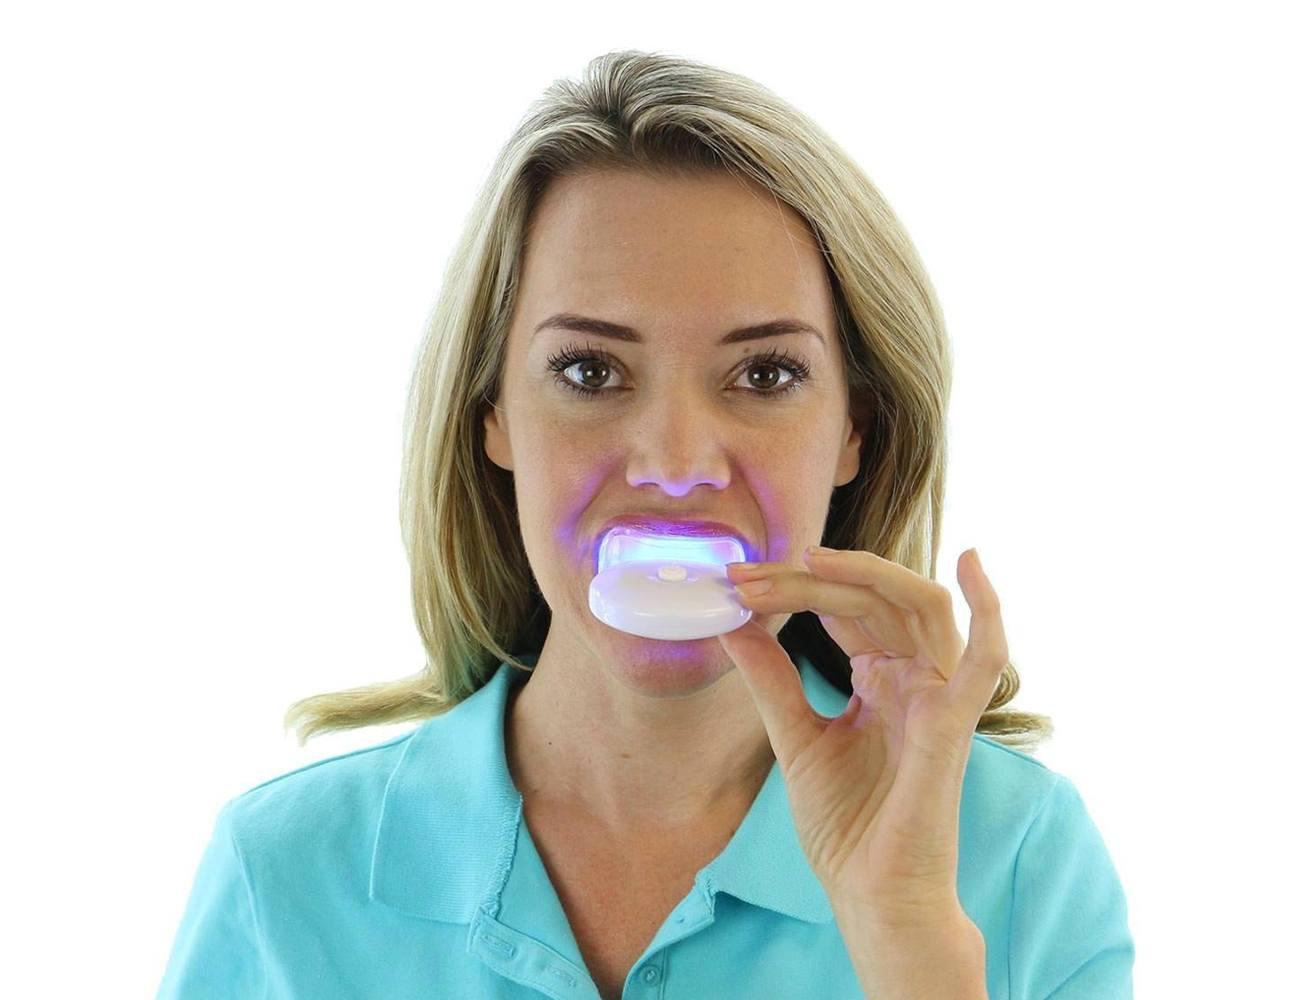 AuraGlow Home Teeth Whitening System